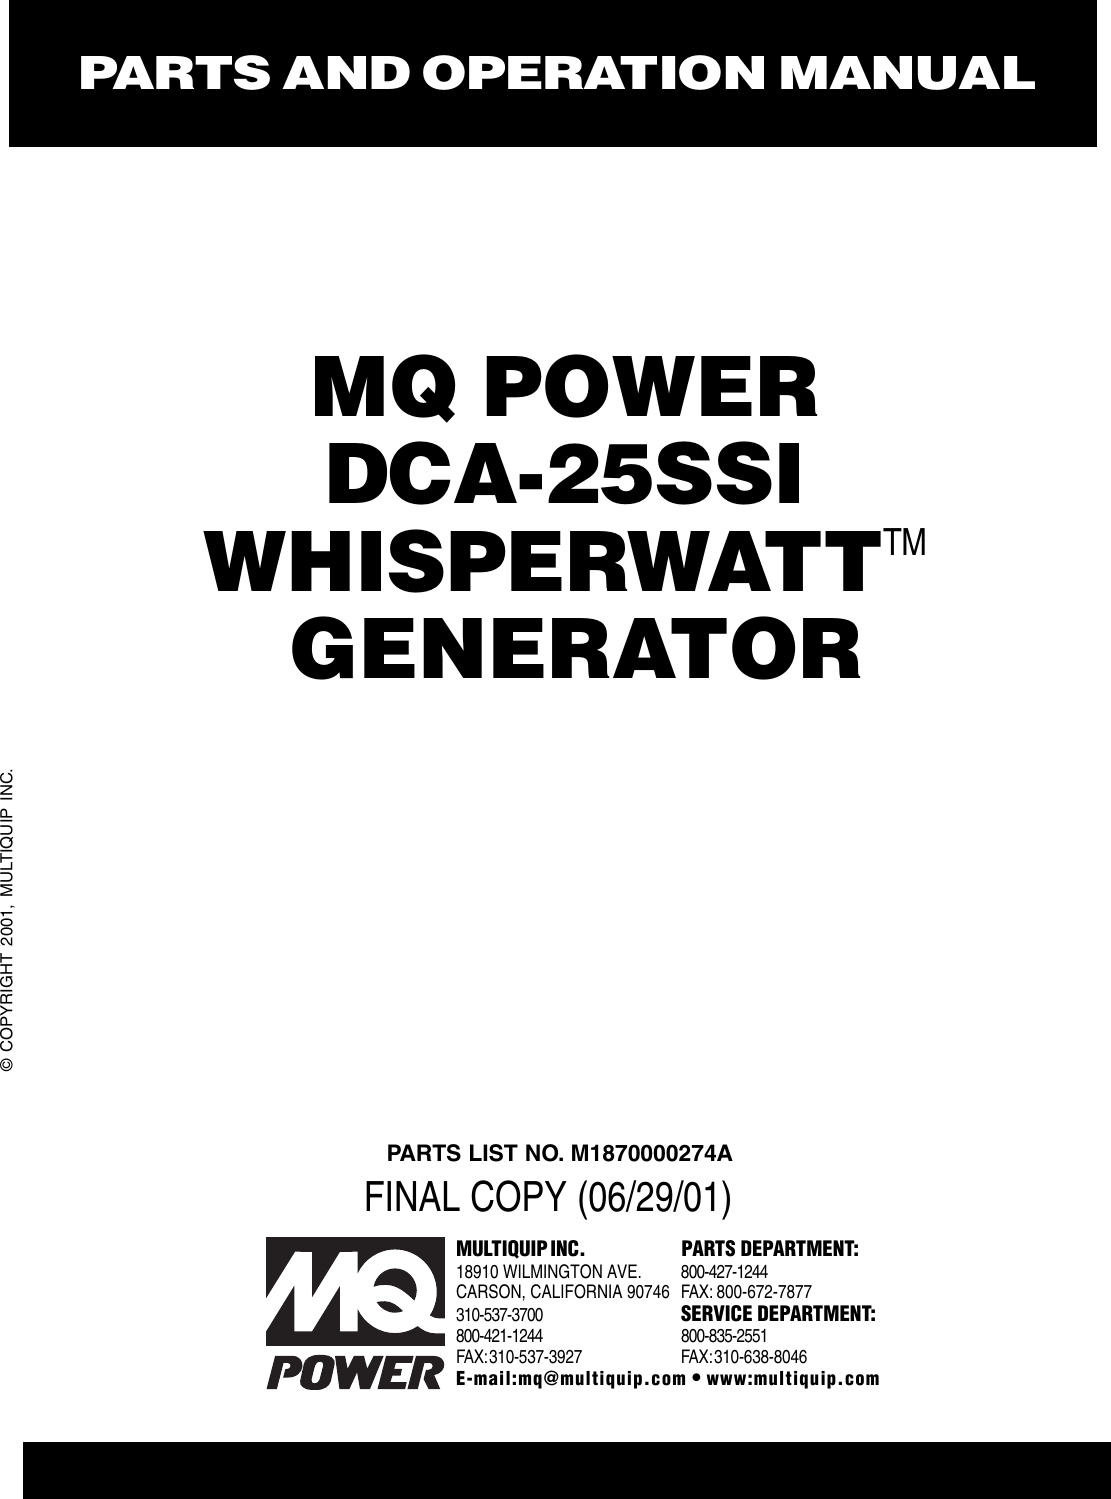 Pleated Microglass Media Millennium Filters FILTREC MN-WG332 Direct Interchange for FILTREC-WG332